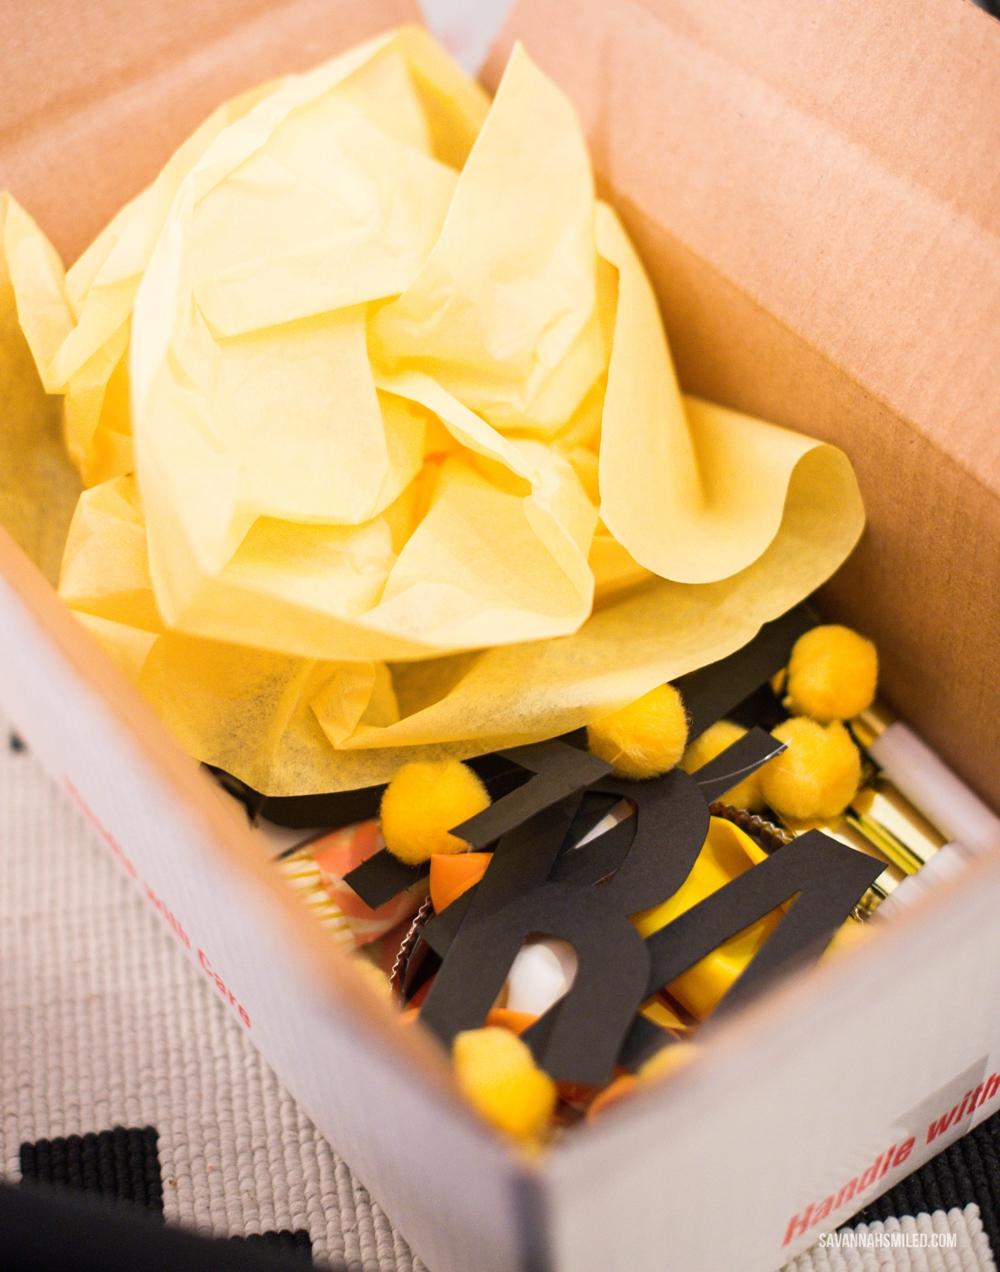 birthday-in-box-shipping-10.jpg